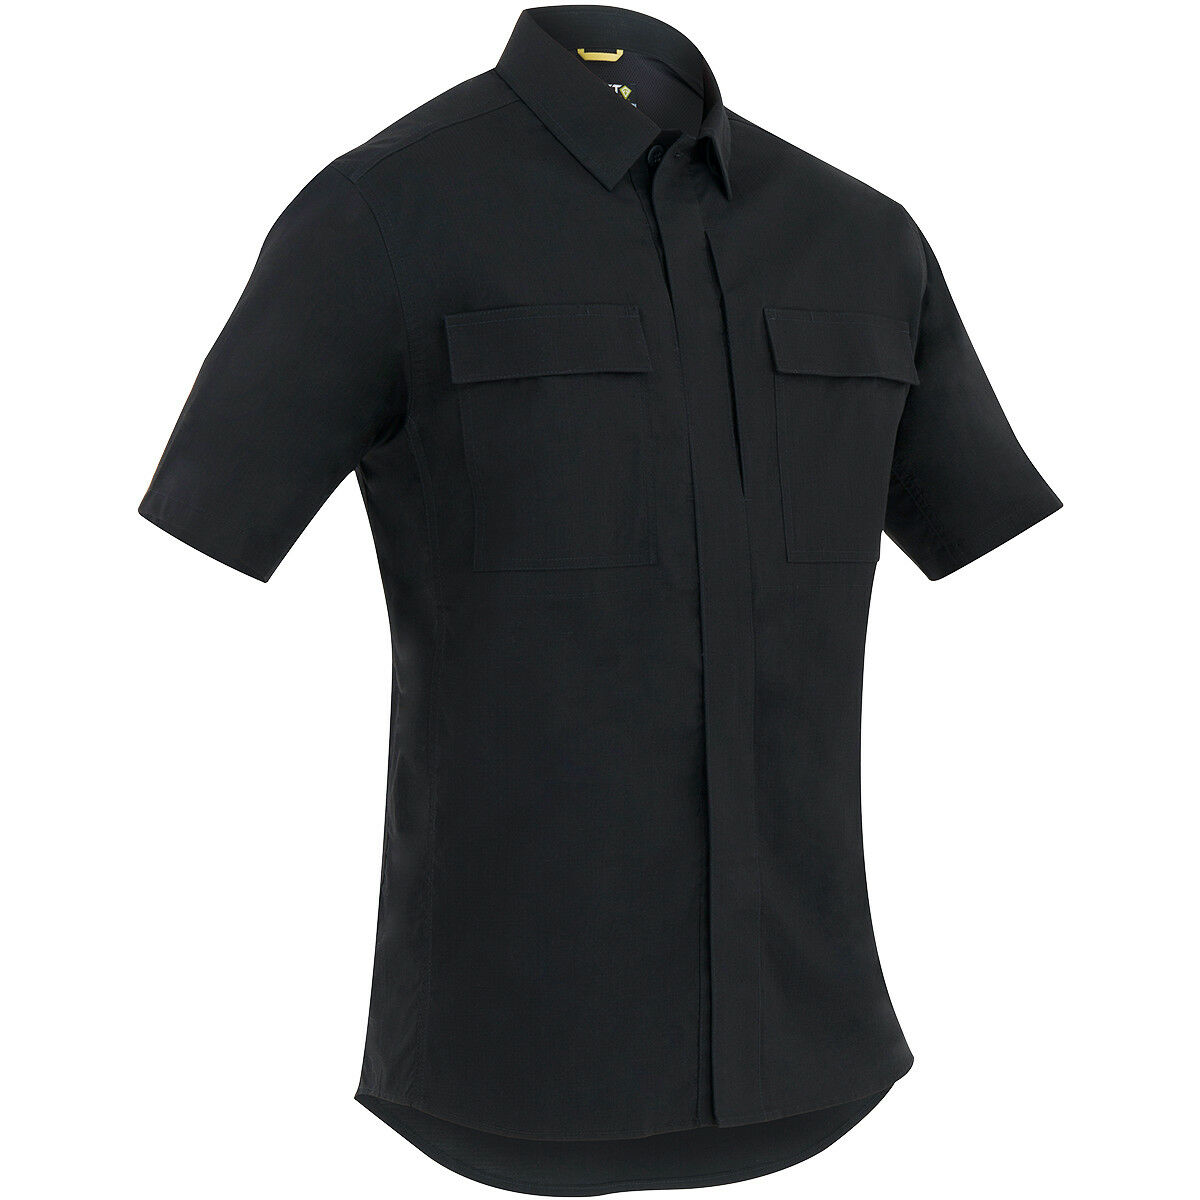 First Tactical Uomo Tactix Manica Corta Bdu Camicia Polizia Sicurezza Top Nero